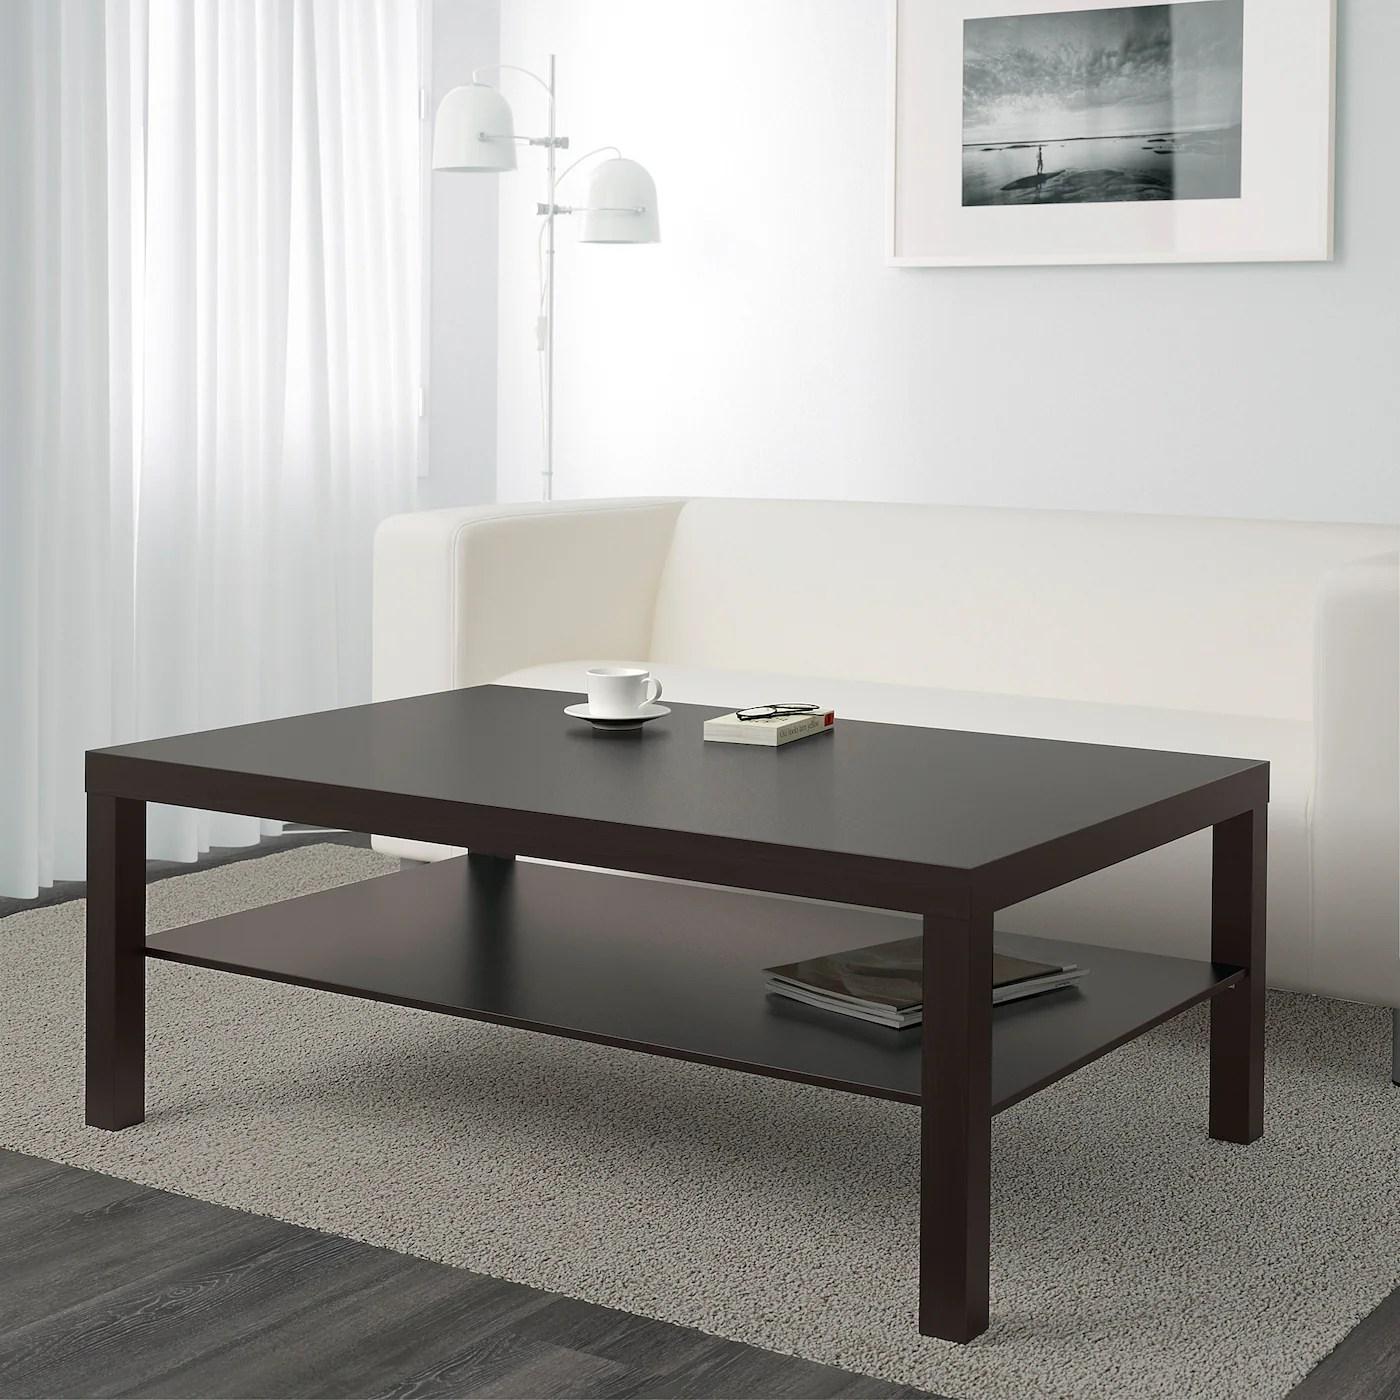 lack coffee table black brown 46 1 2x30 3 4